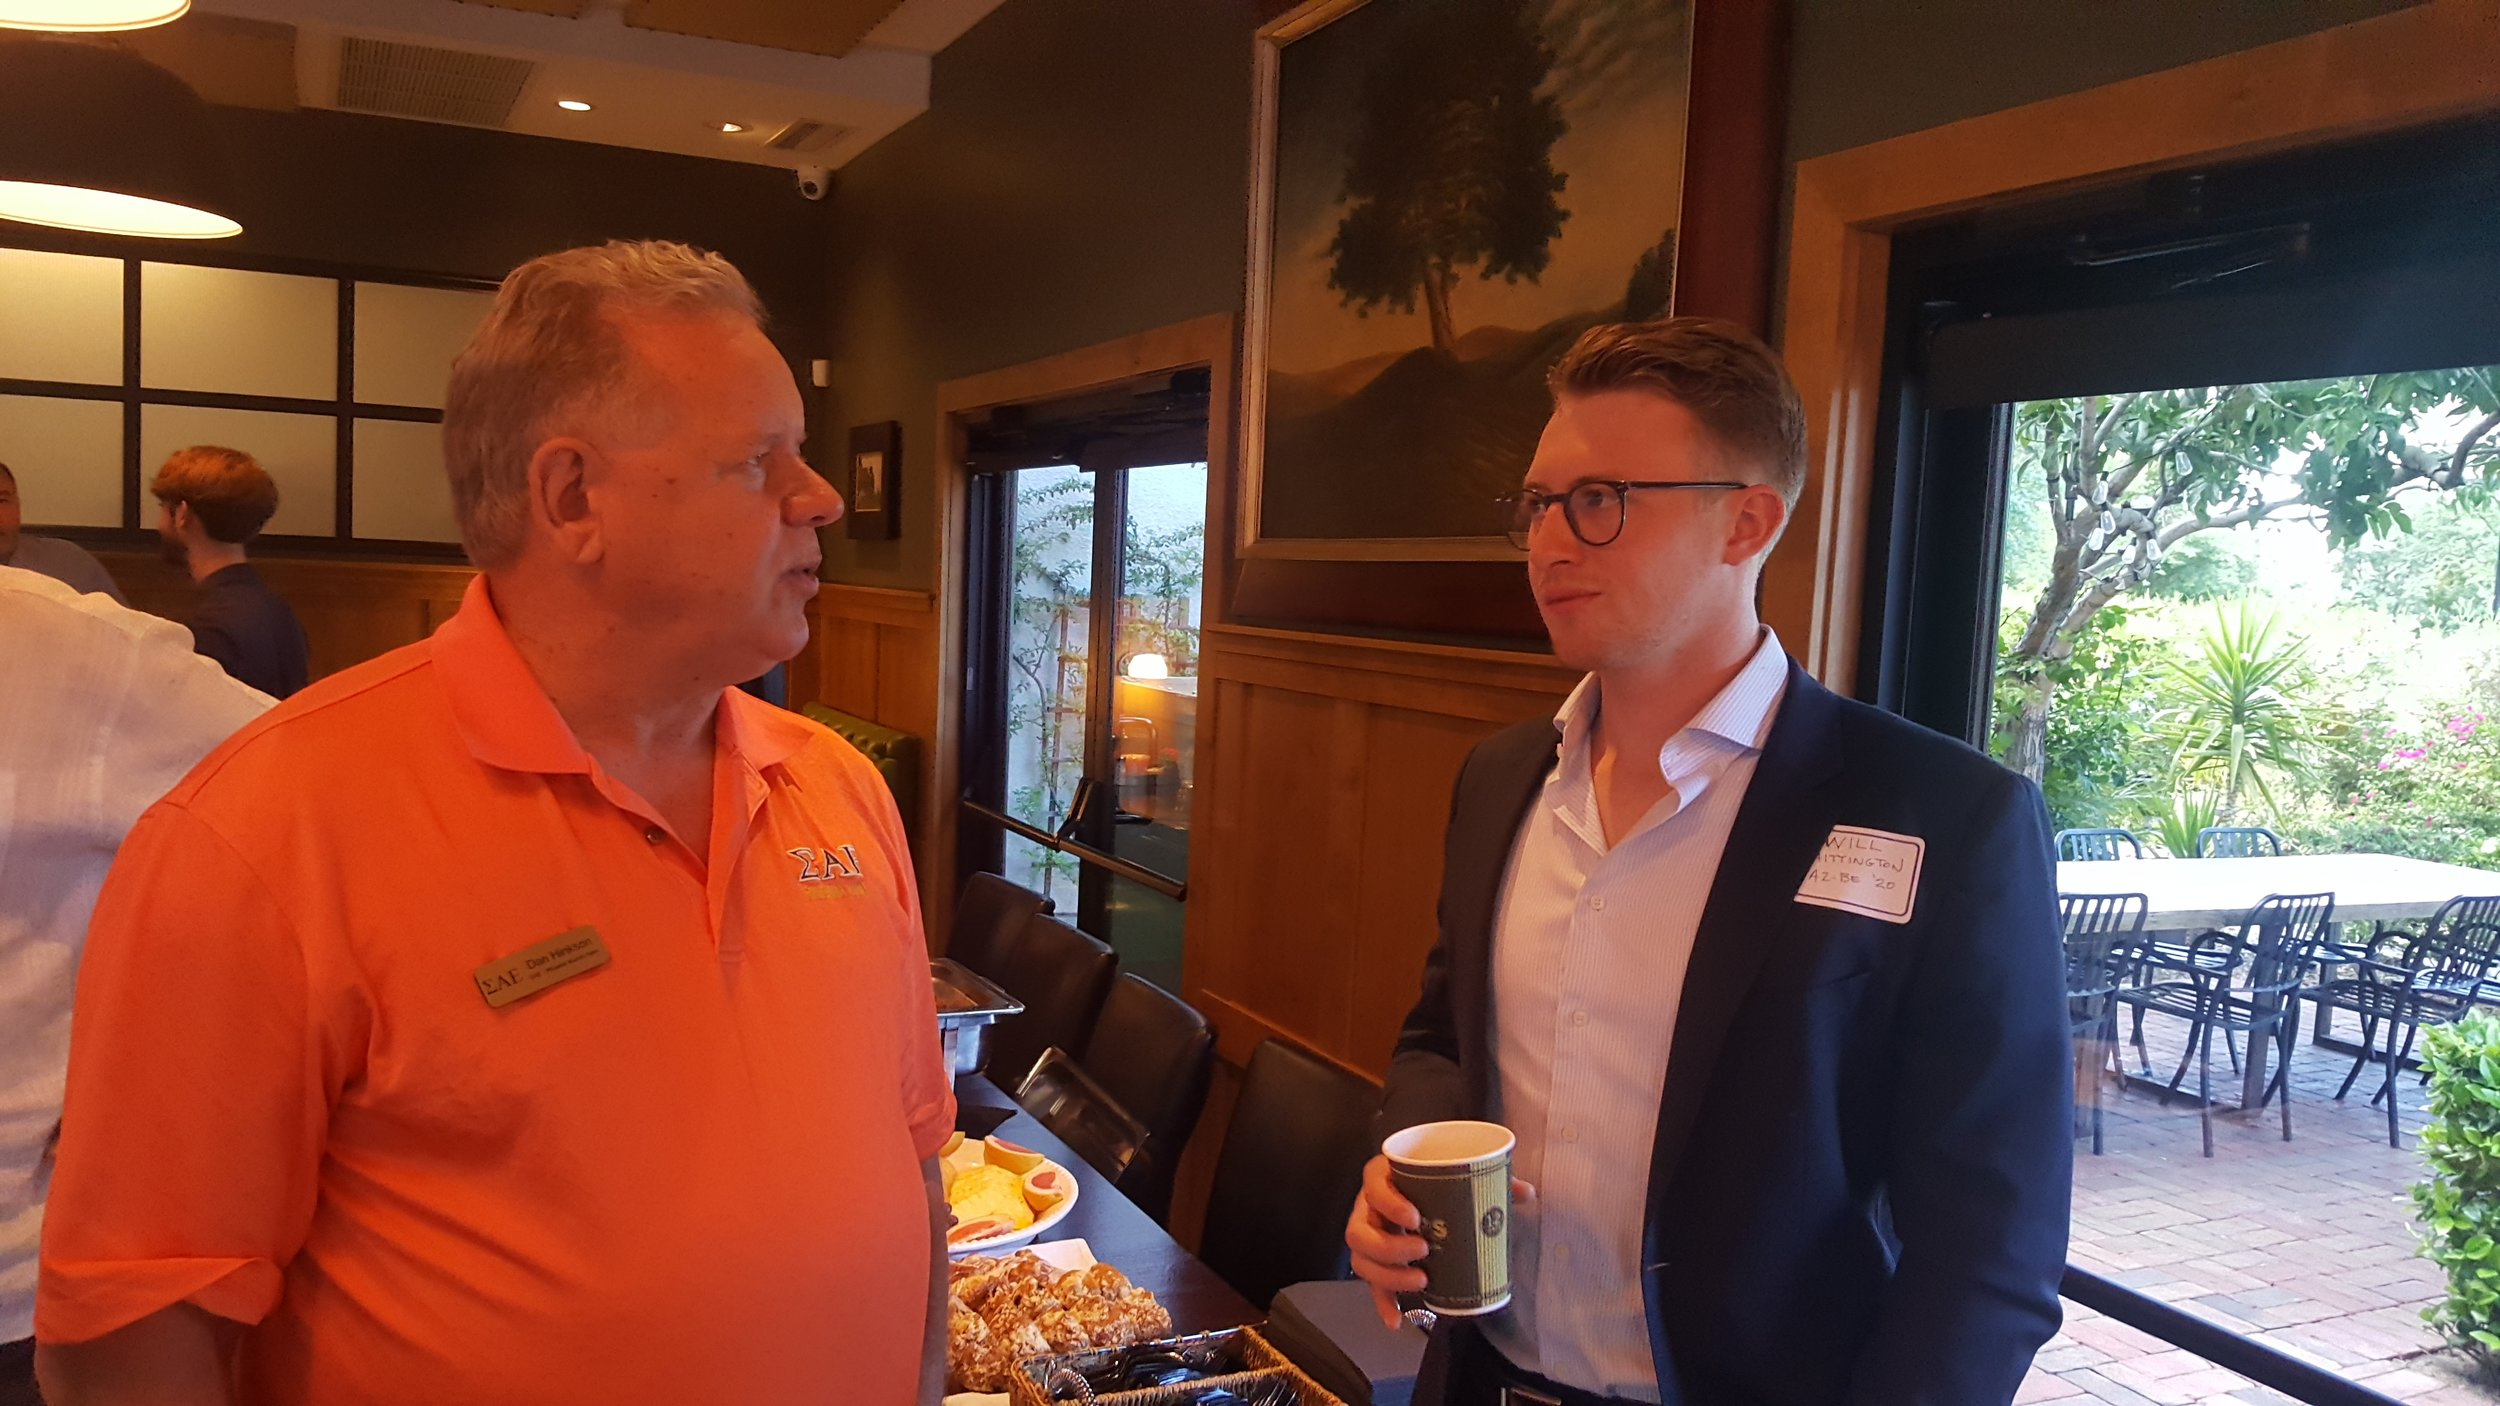 Future interview - Dan Hinkson, MO Delta '78 discusses development & construction market in Phoenix with undergrad Will WIllingham, AZ Beta '20.